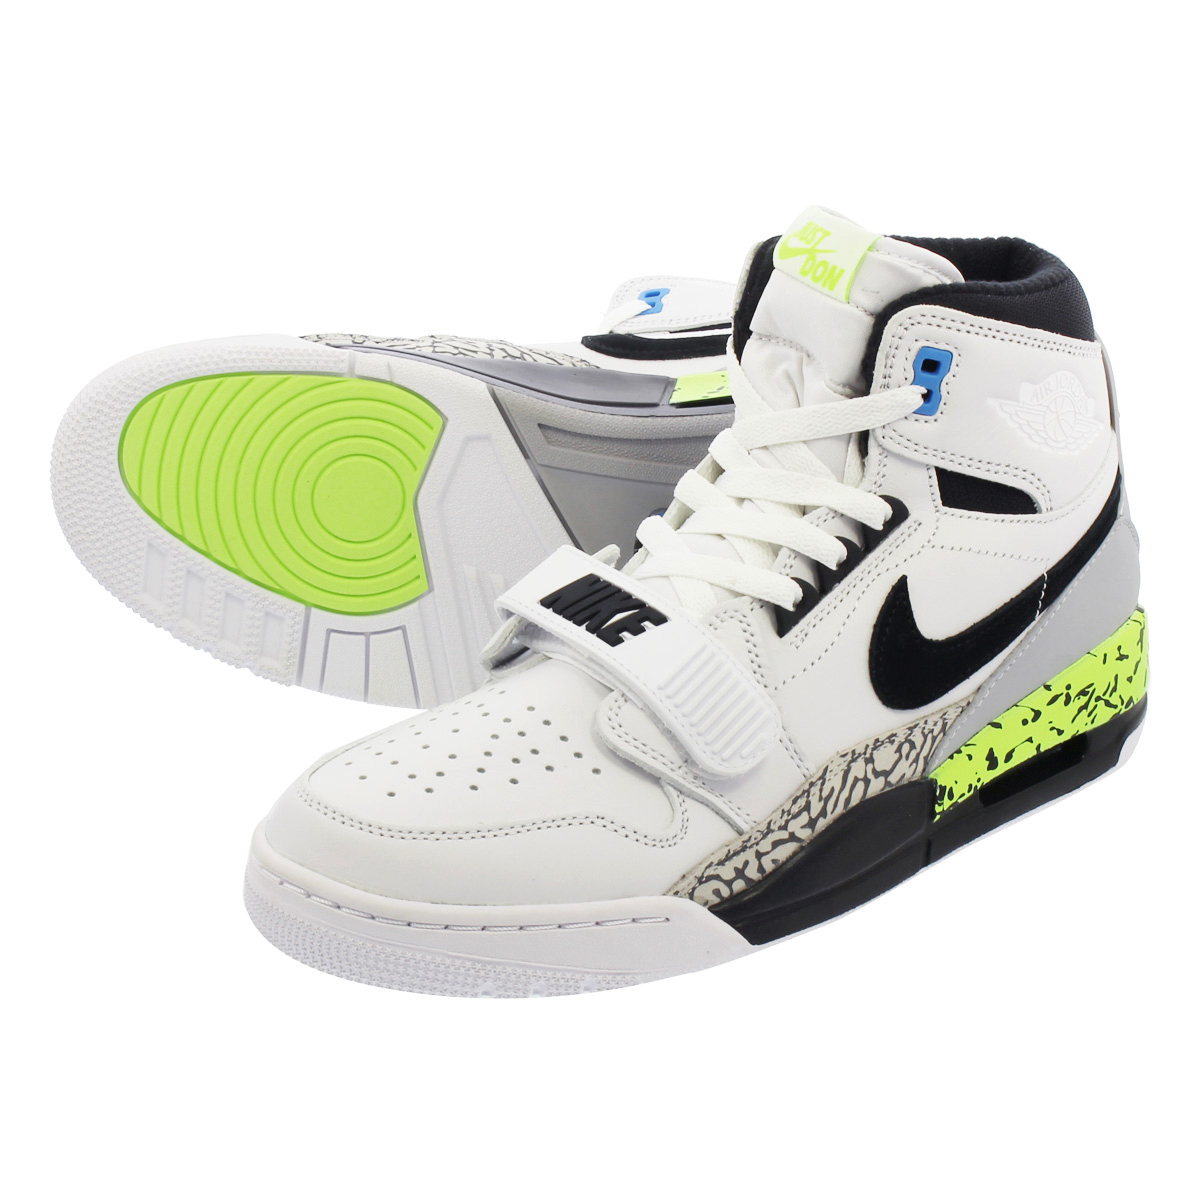 quality design ff6a7 e0c10 NIKE AIR JORDAN LEGACY 312 NRG Nike Air Jordan Legacy 312 NRG WHITE VOLT VIVID  BLUE